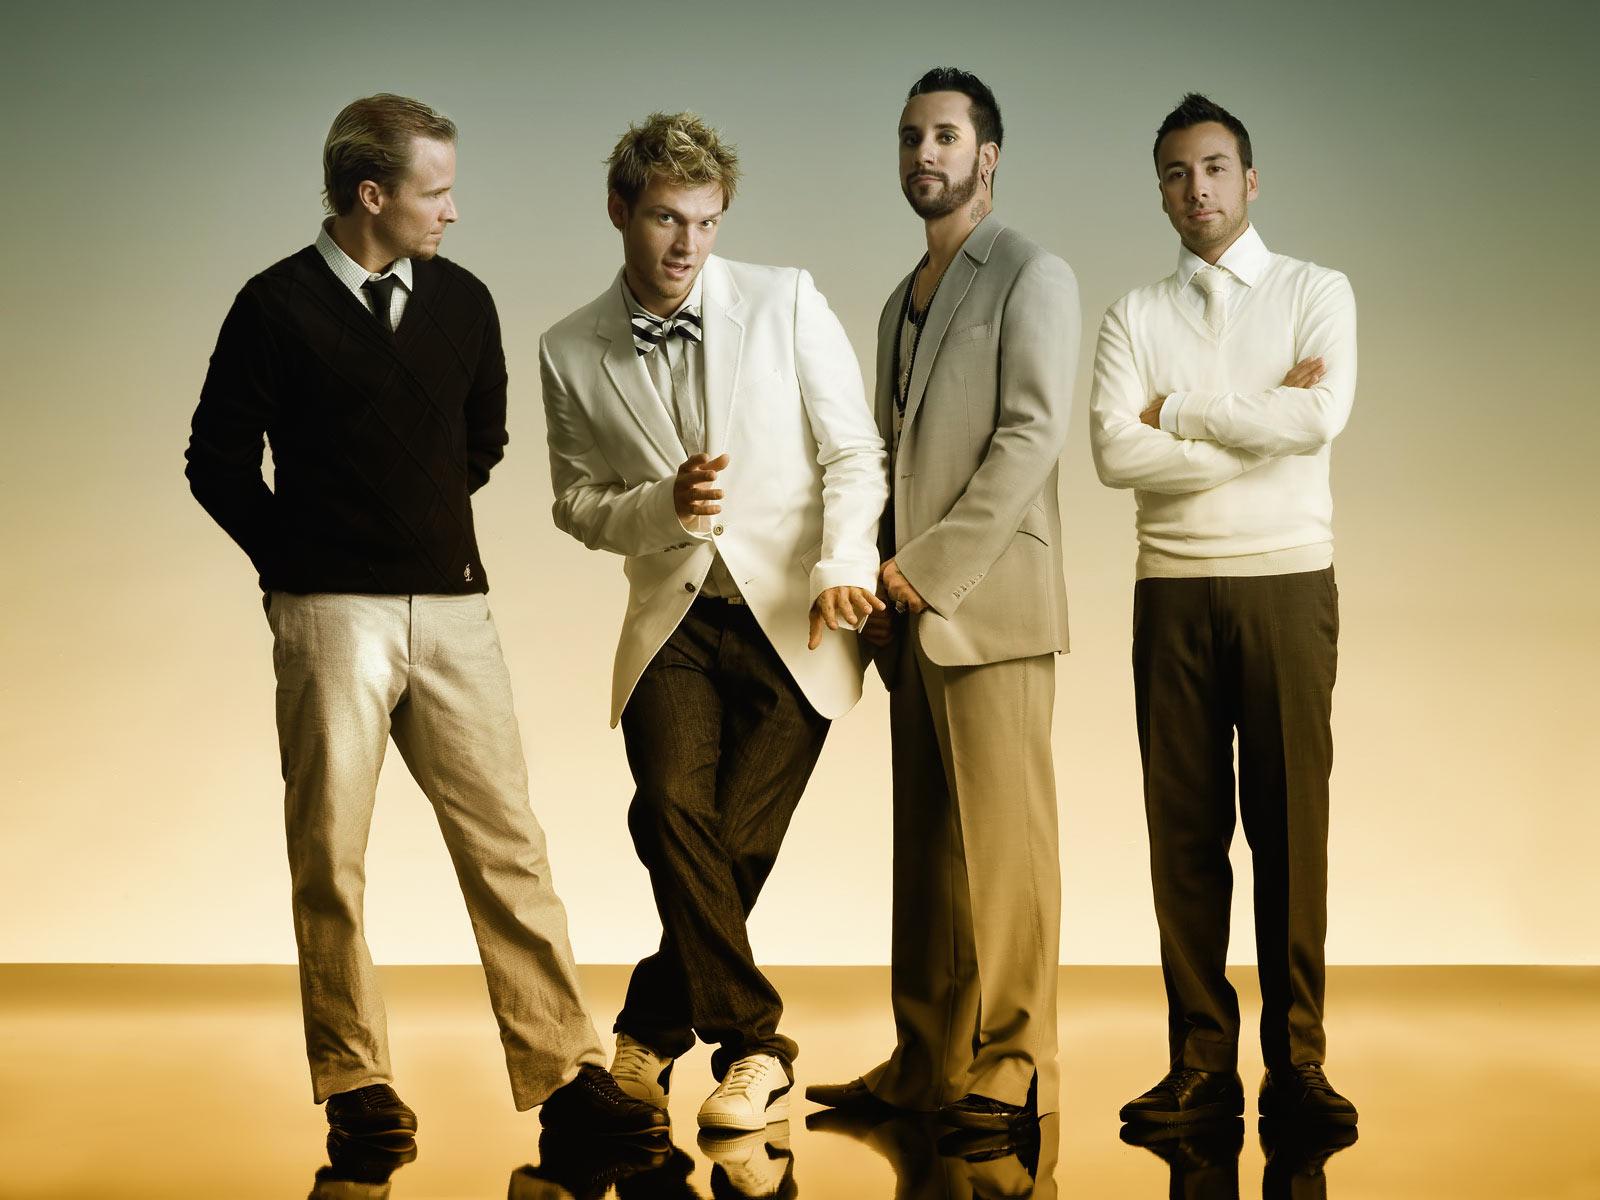 http://2.bp.blogspot.com/_Z1lxf_WQedA/THNbOVQ7WJI/AAAAAAAABGk/_QvPY4yKqzk/s1600/Backstreet_Boys_-_Never_Gone.jpg